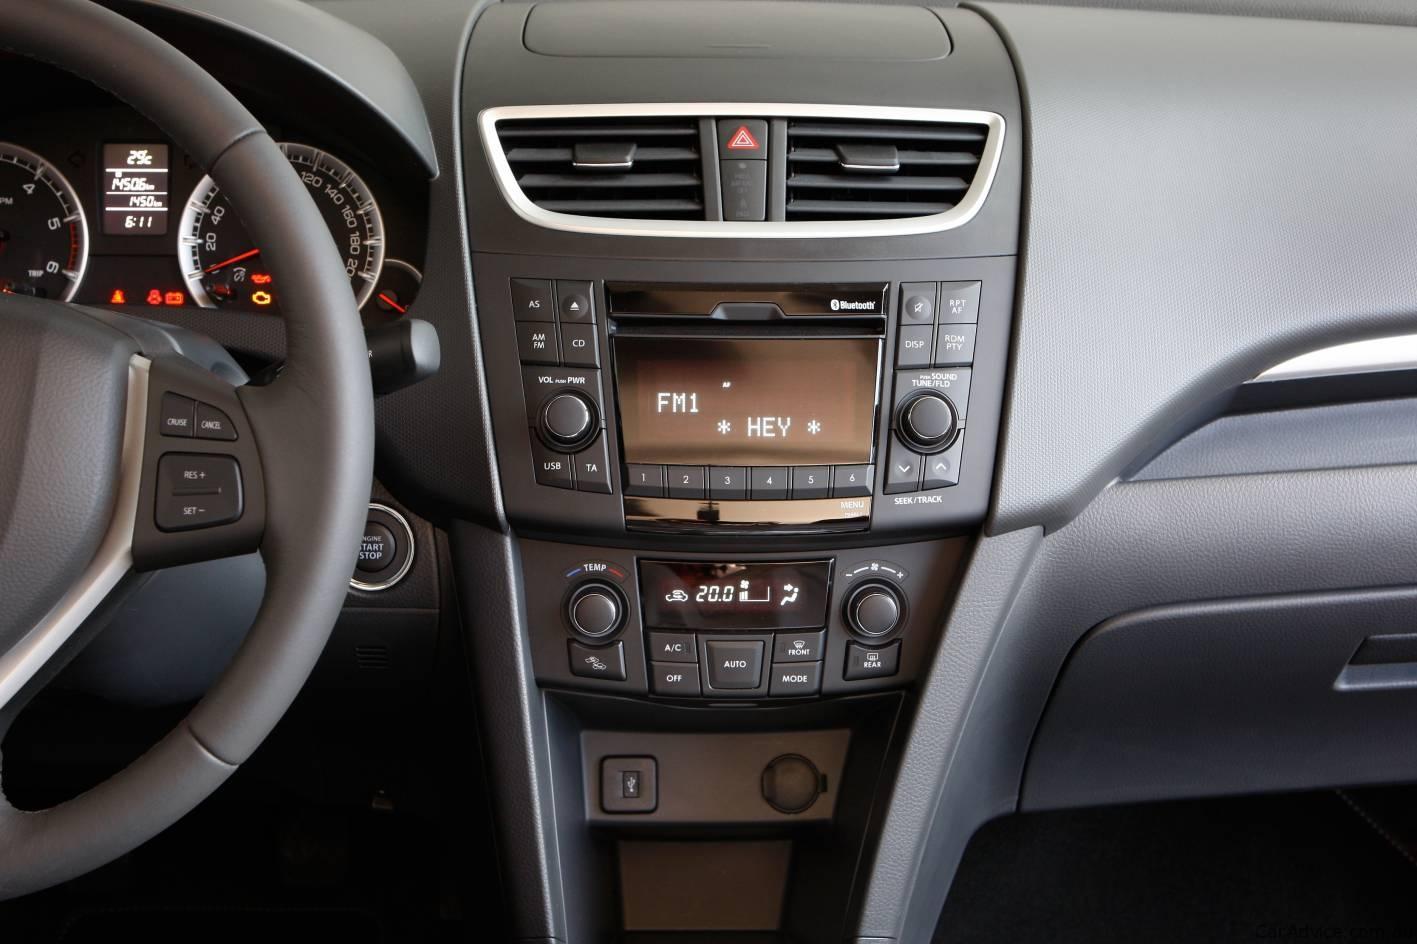 Genesis Sports Car >> 2011 Suzuki Swift interior revealed in new images - photos | CarAdvice